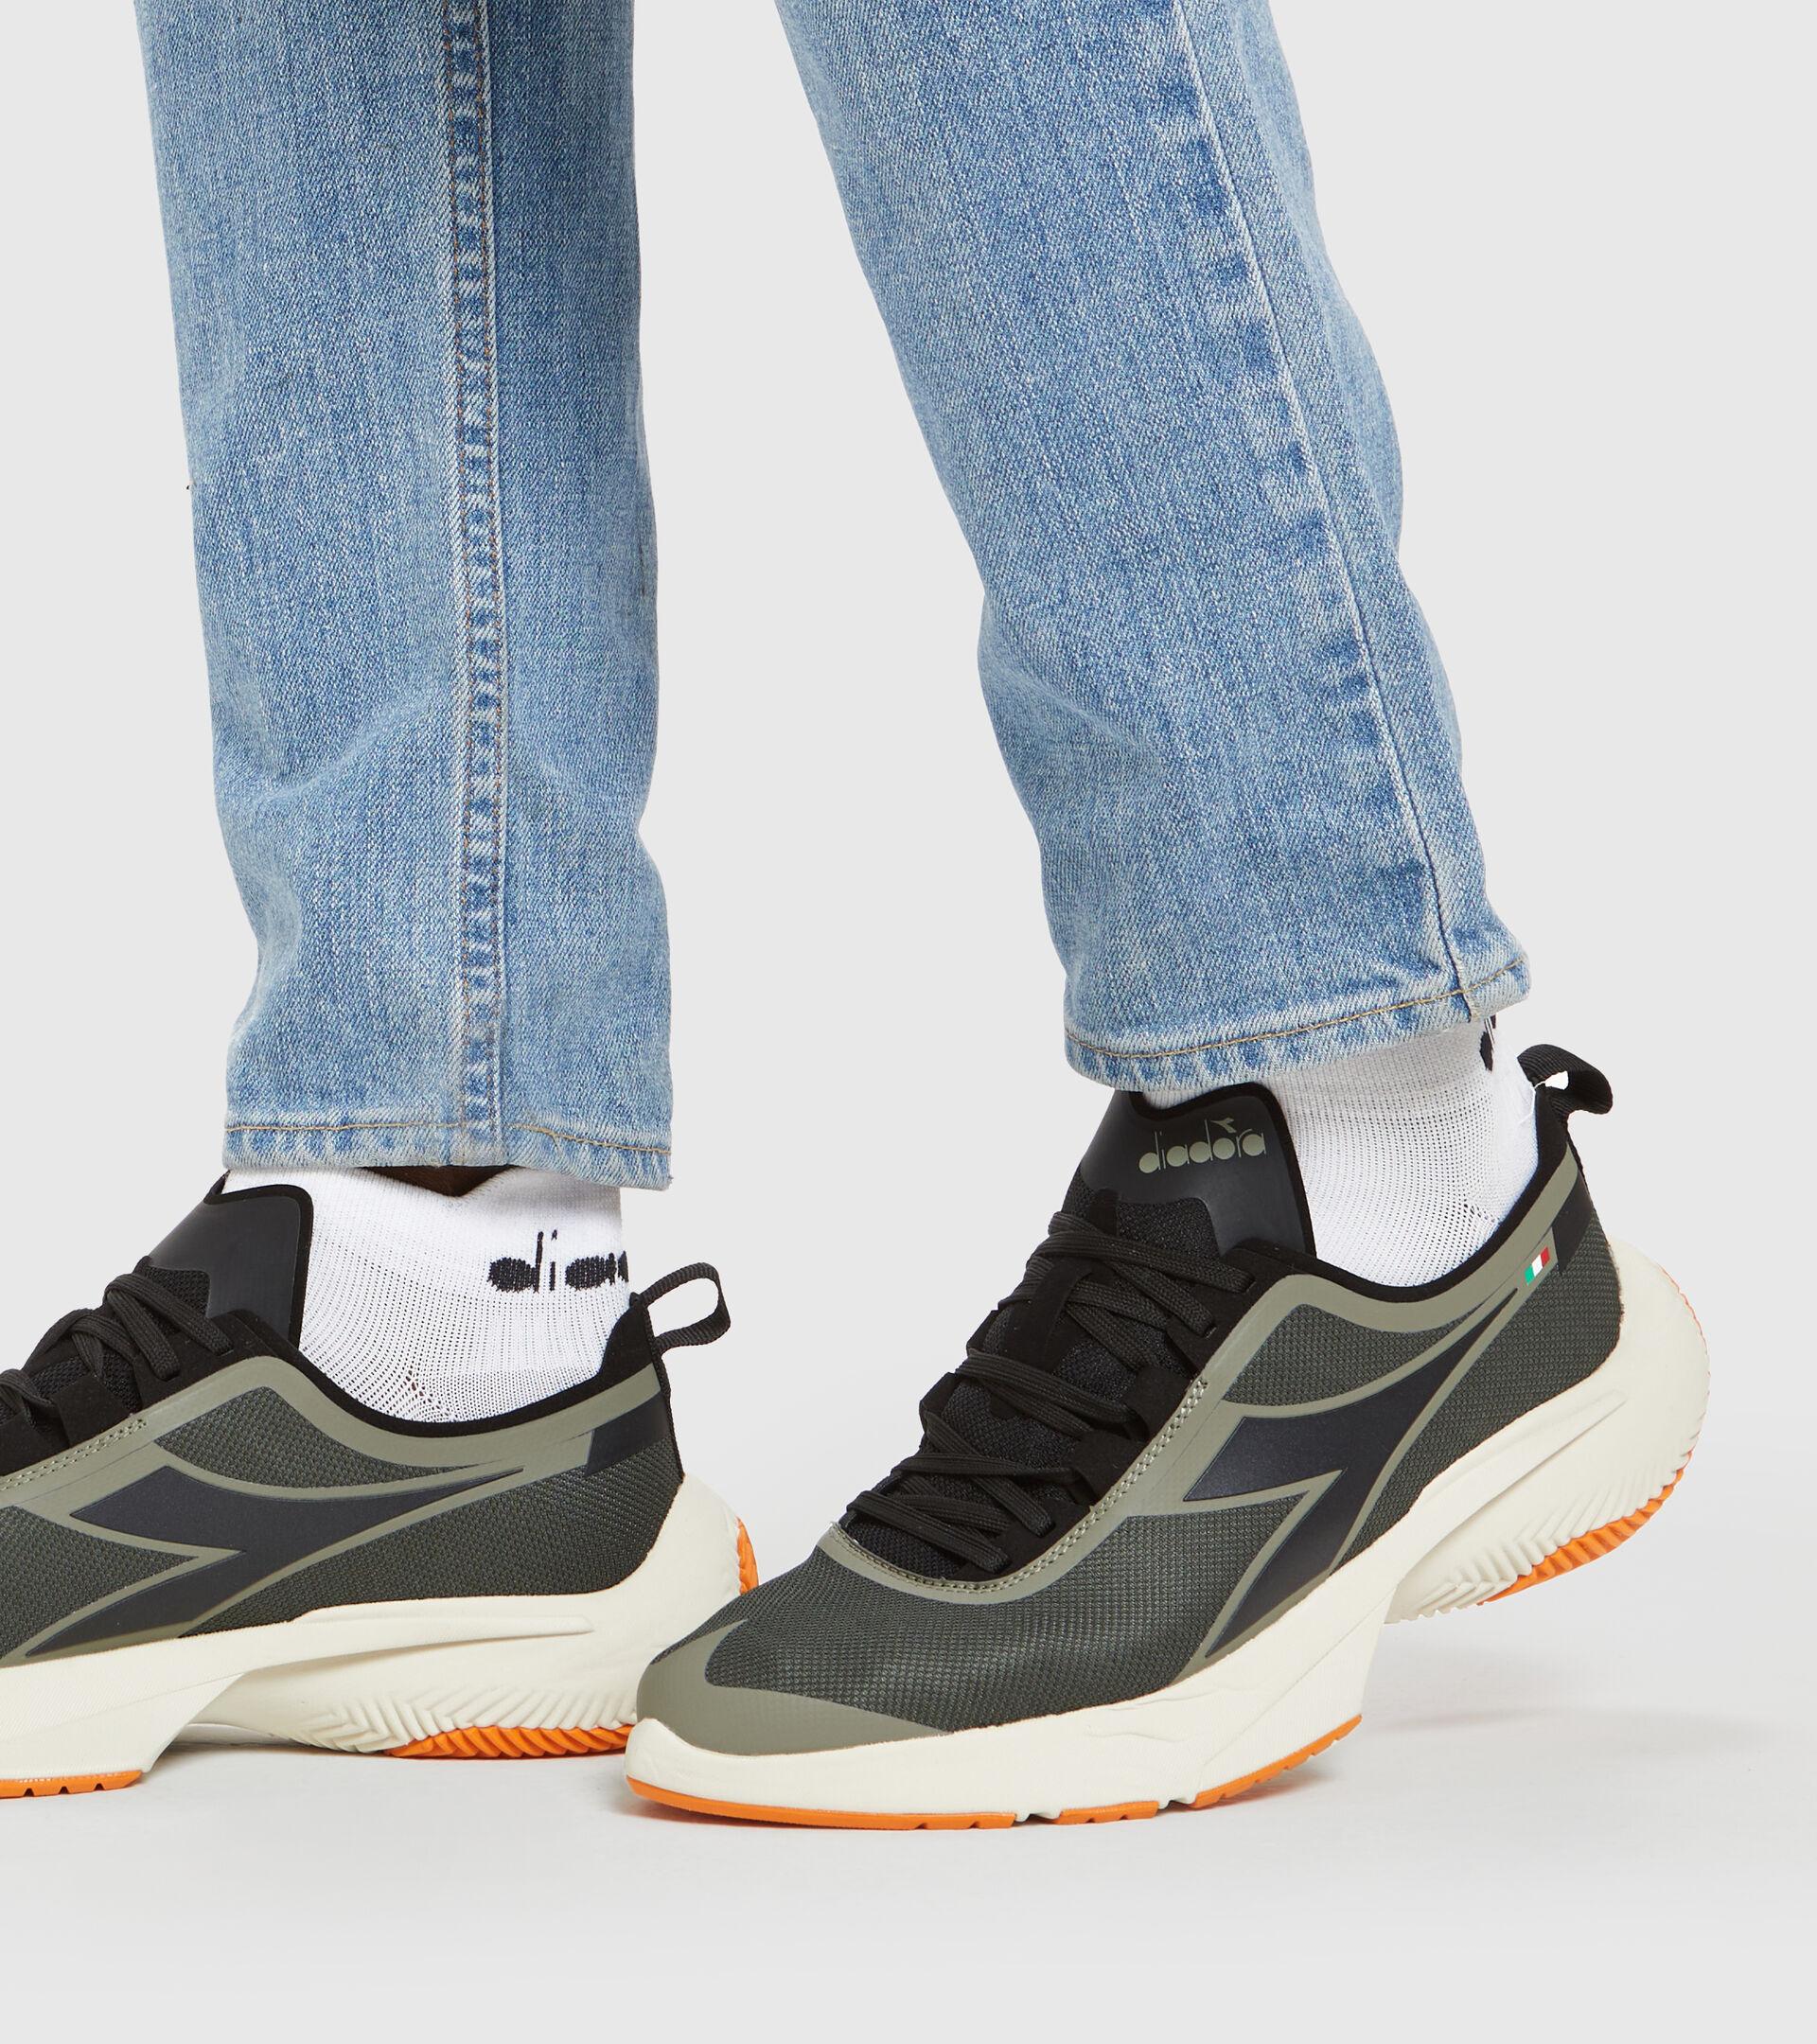 Footwear Sportswear UNISEX URBAN EQUIPE LIBRA VERDE TIMO Diadora